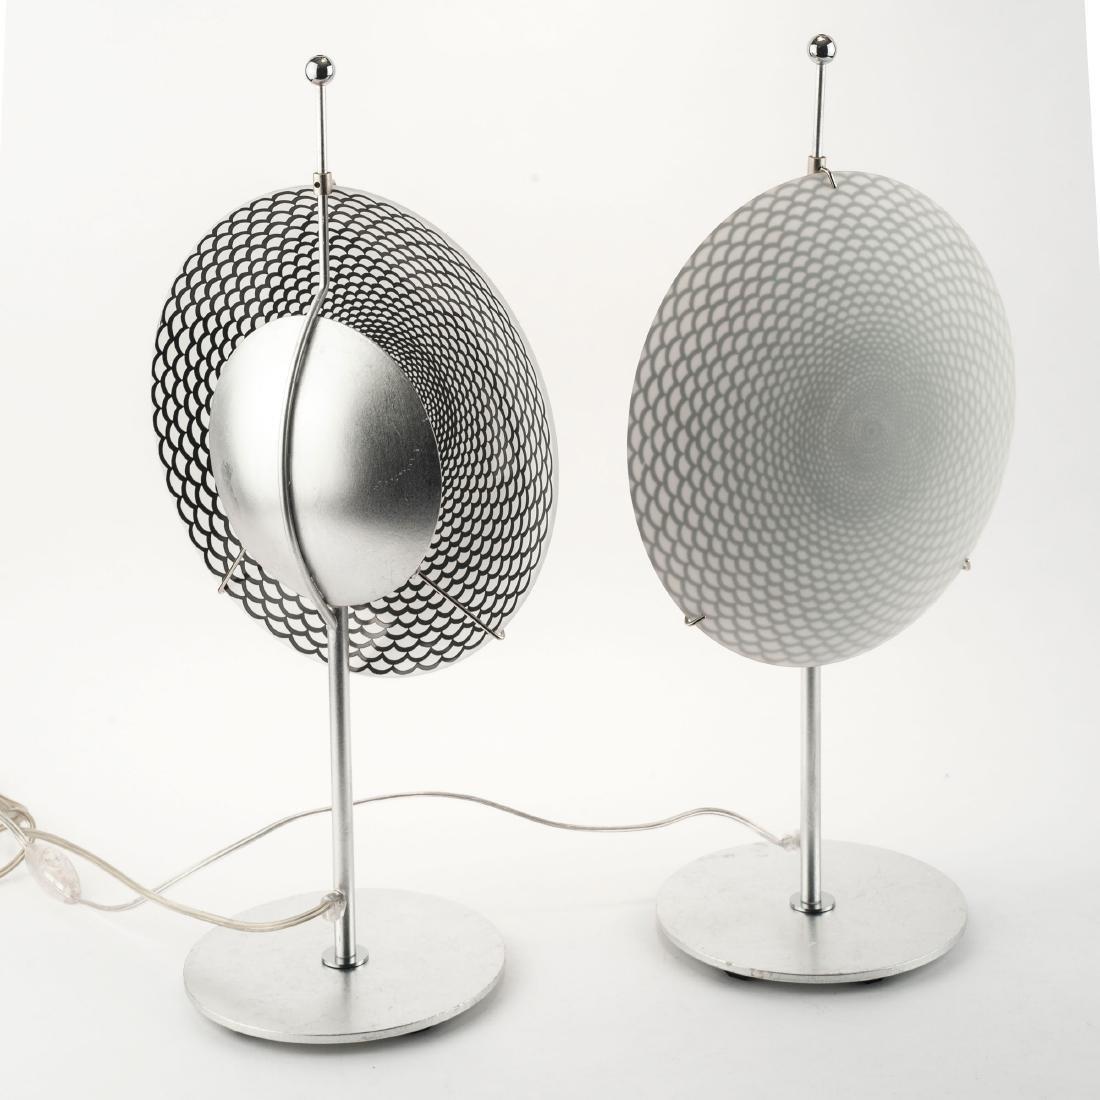 Two 'Ottica' table lights, c1995 - 2